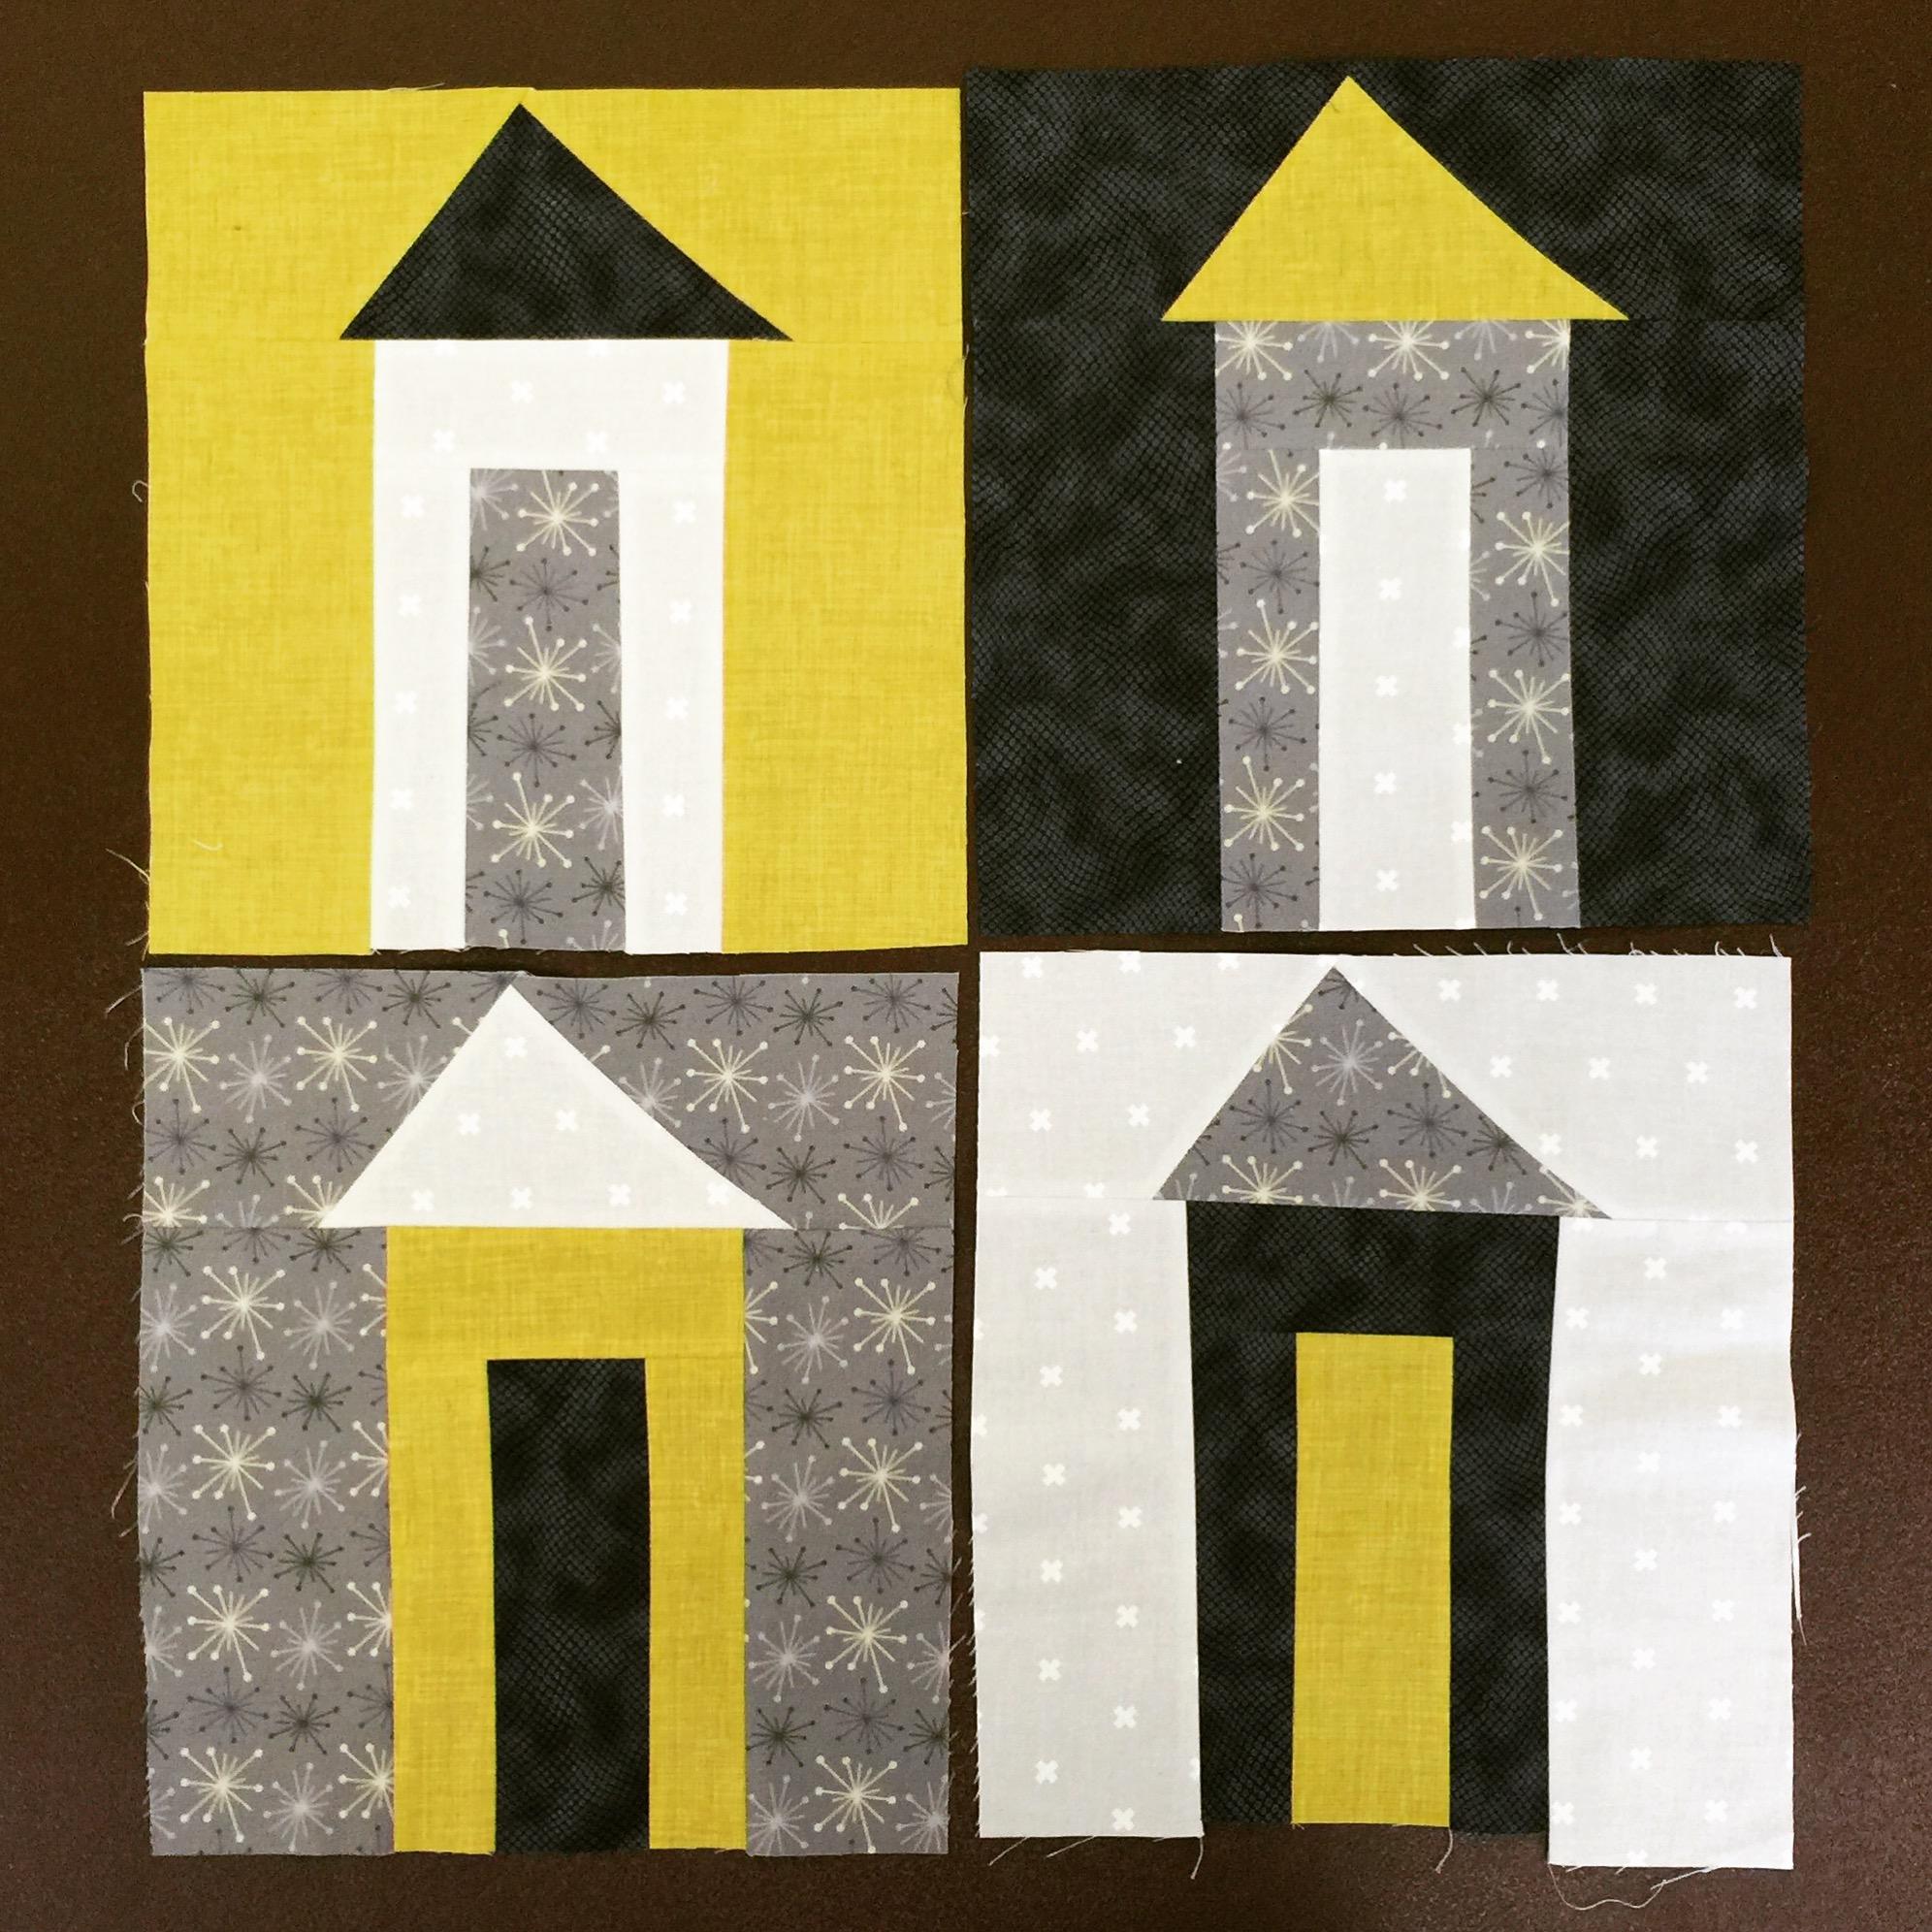 Allison Schnackenberg's blocks for Hive 9